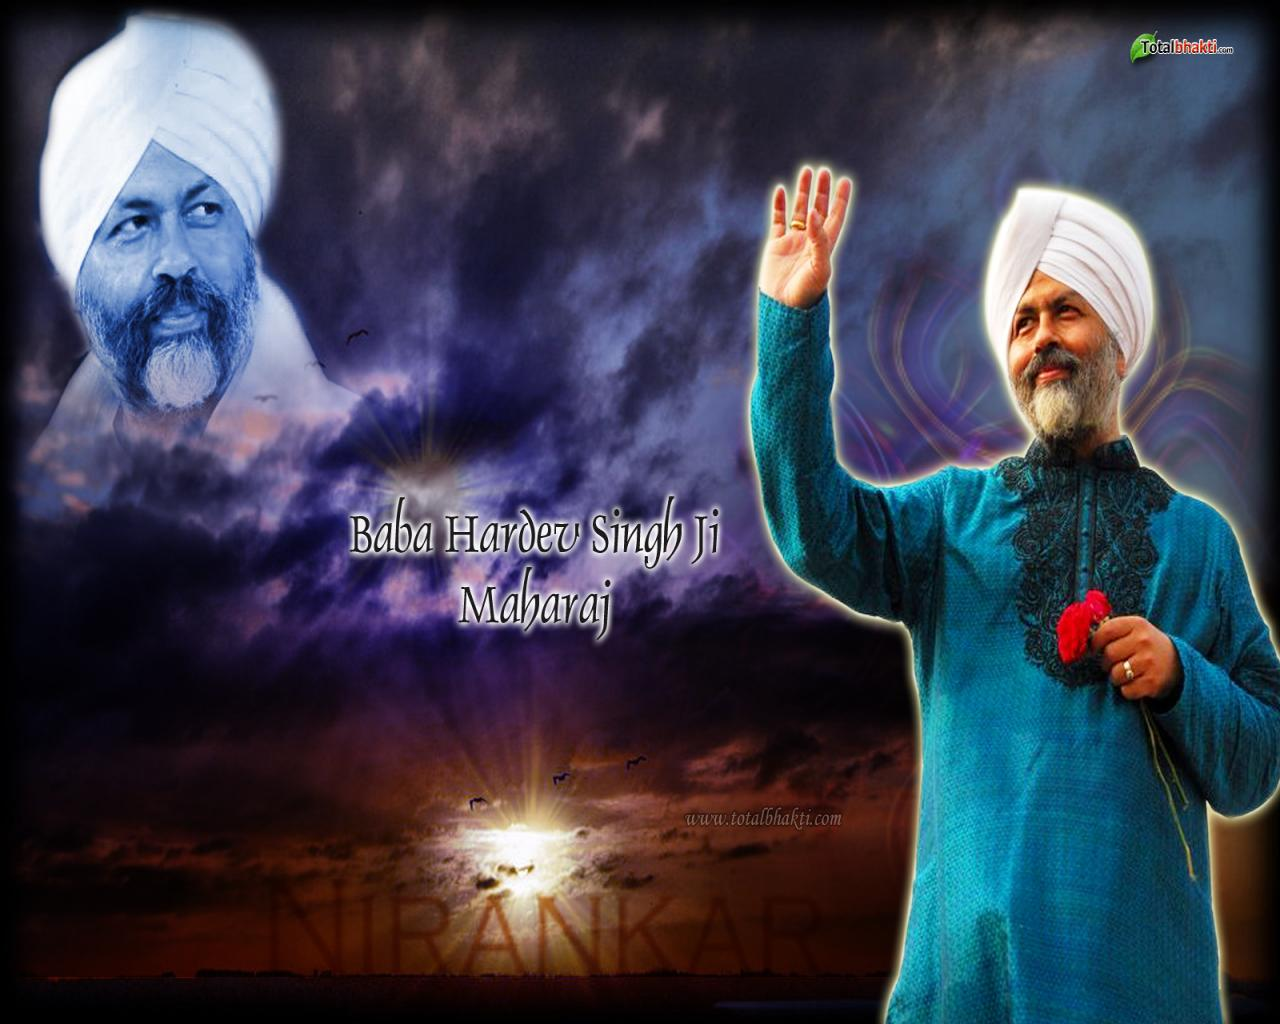 Radha Soami Quotes Wallpaper Wallpaper Nirankari Baba Ji Wallpaper Pictures Gallery